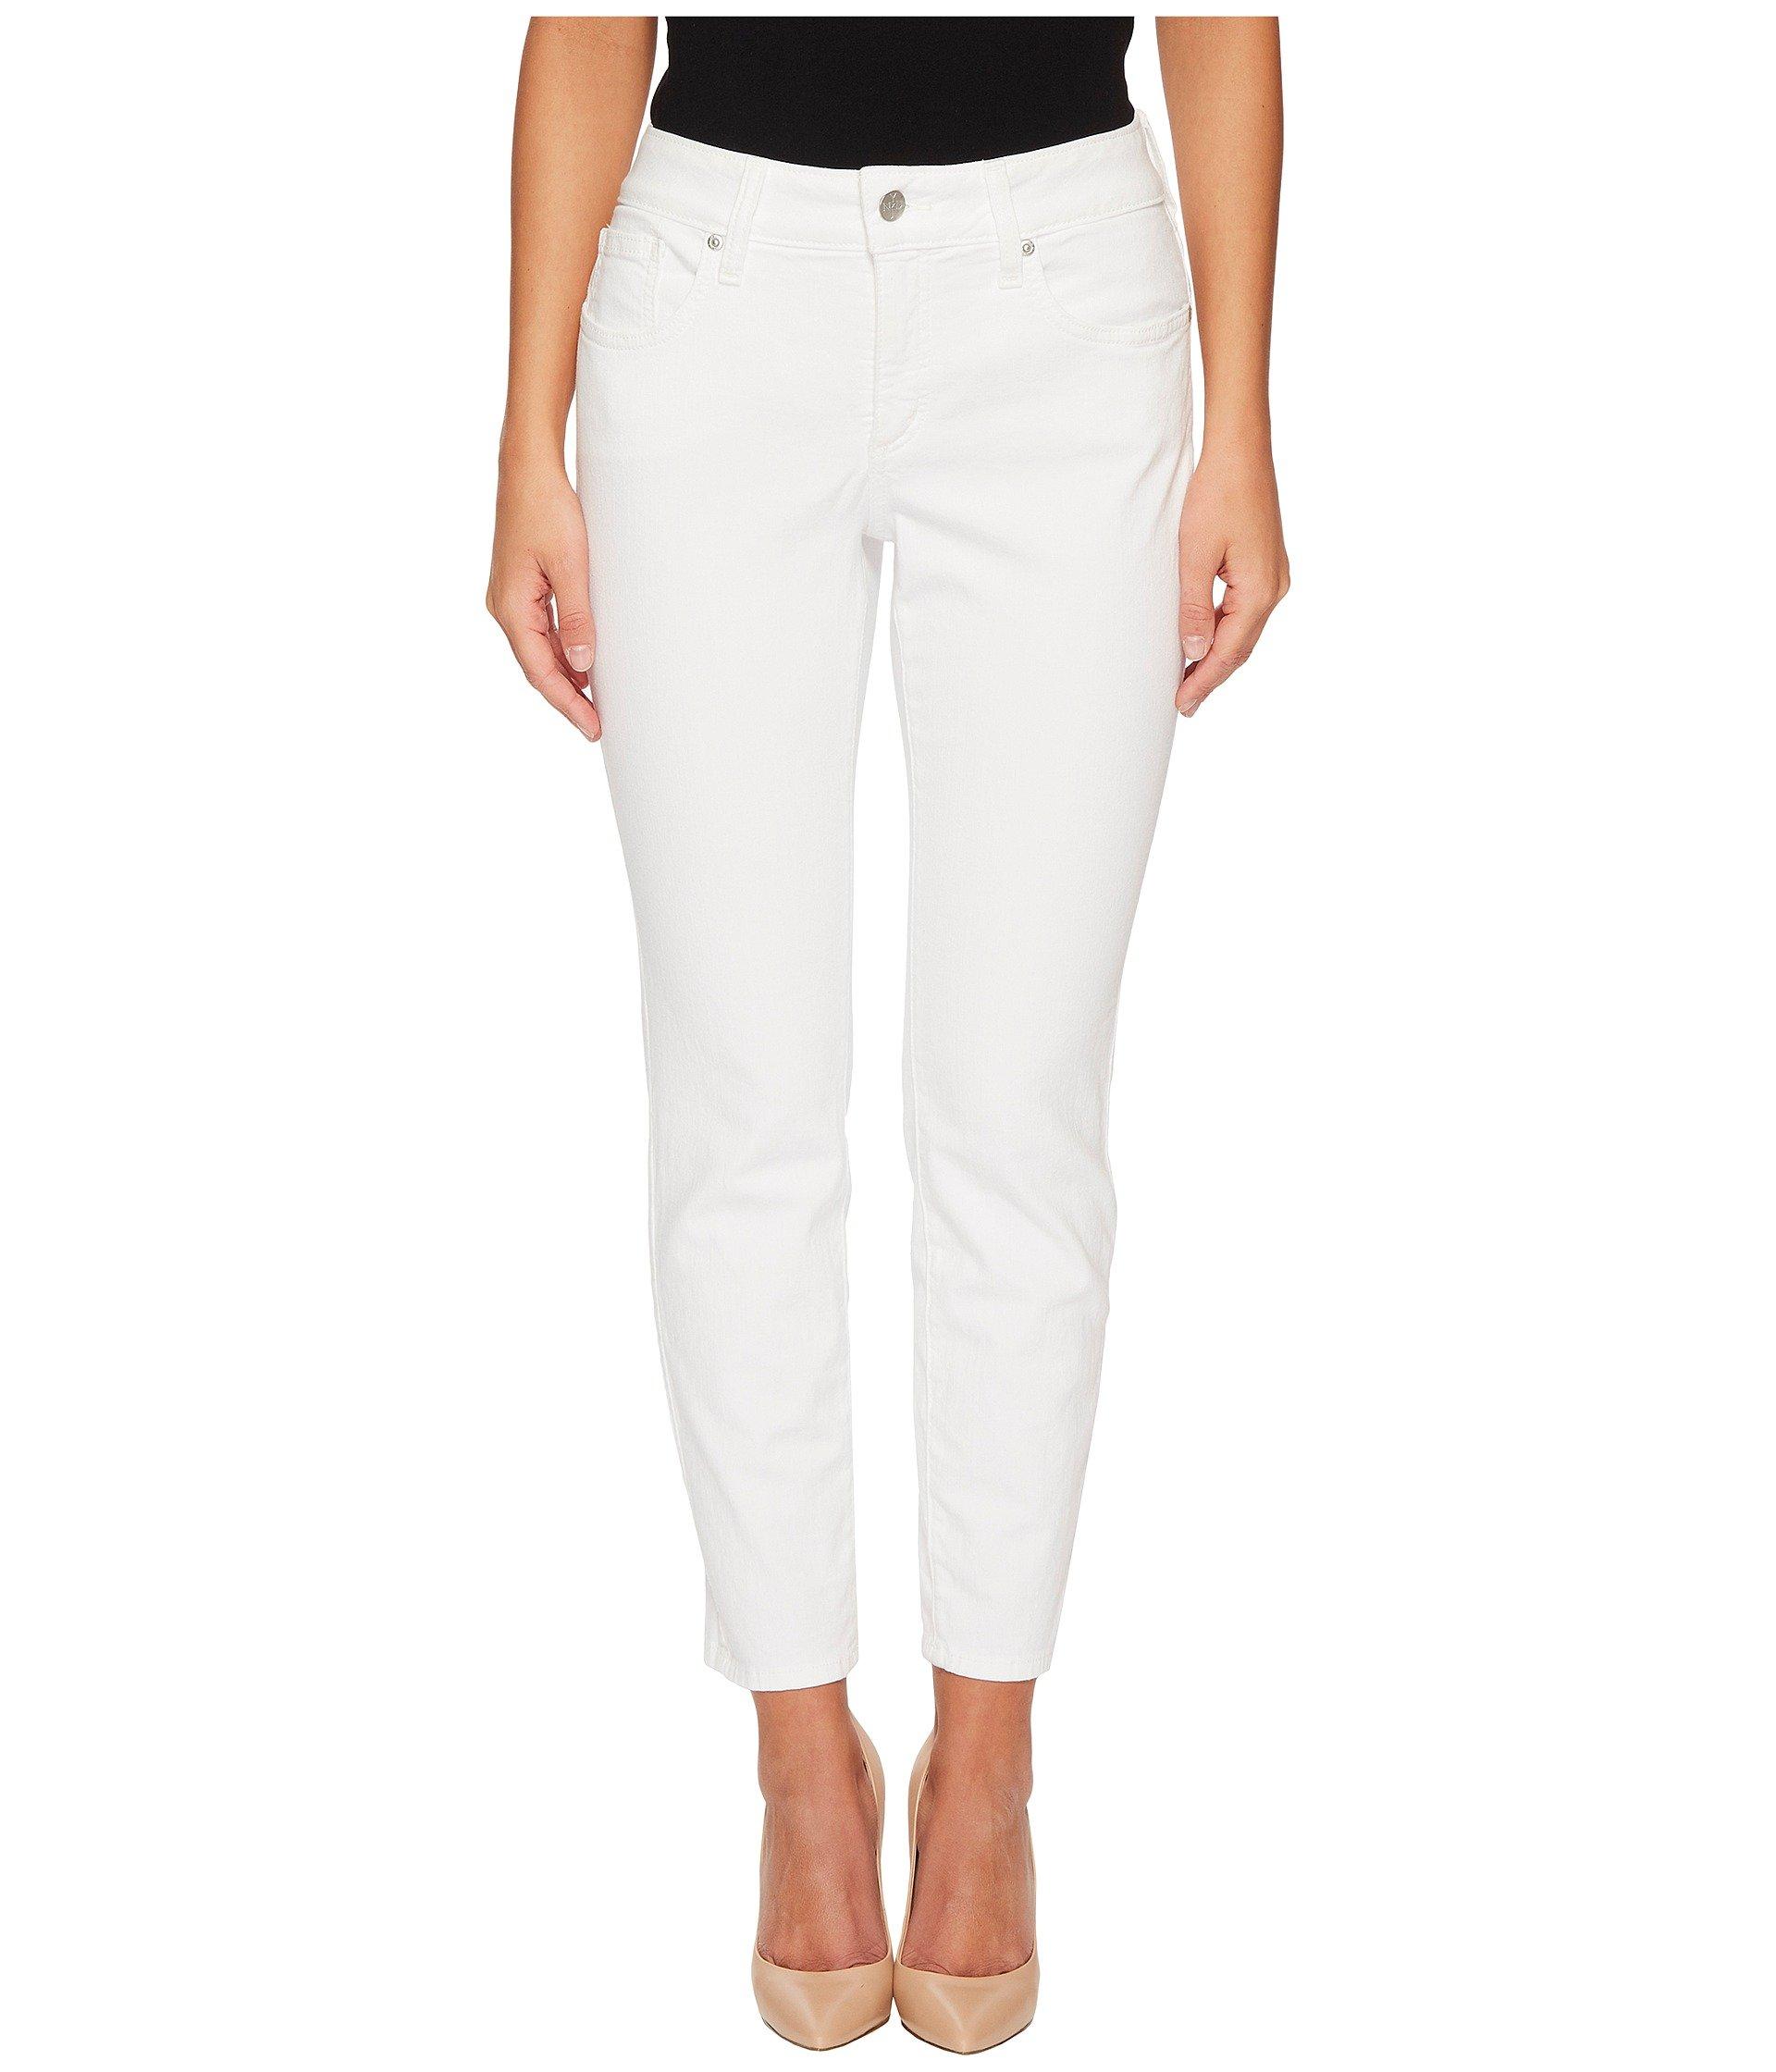 NYDJ Women's Petite Size Alina Ankle Jeans, Deep Optic White, 4P